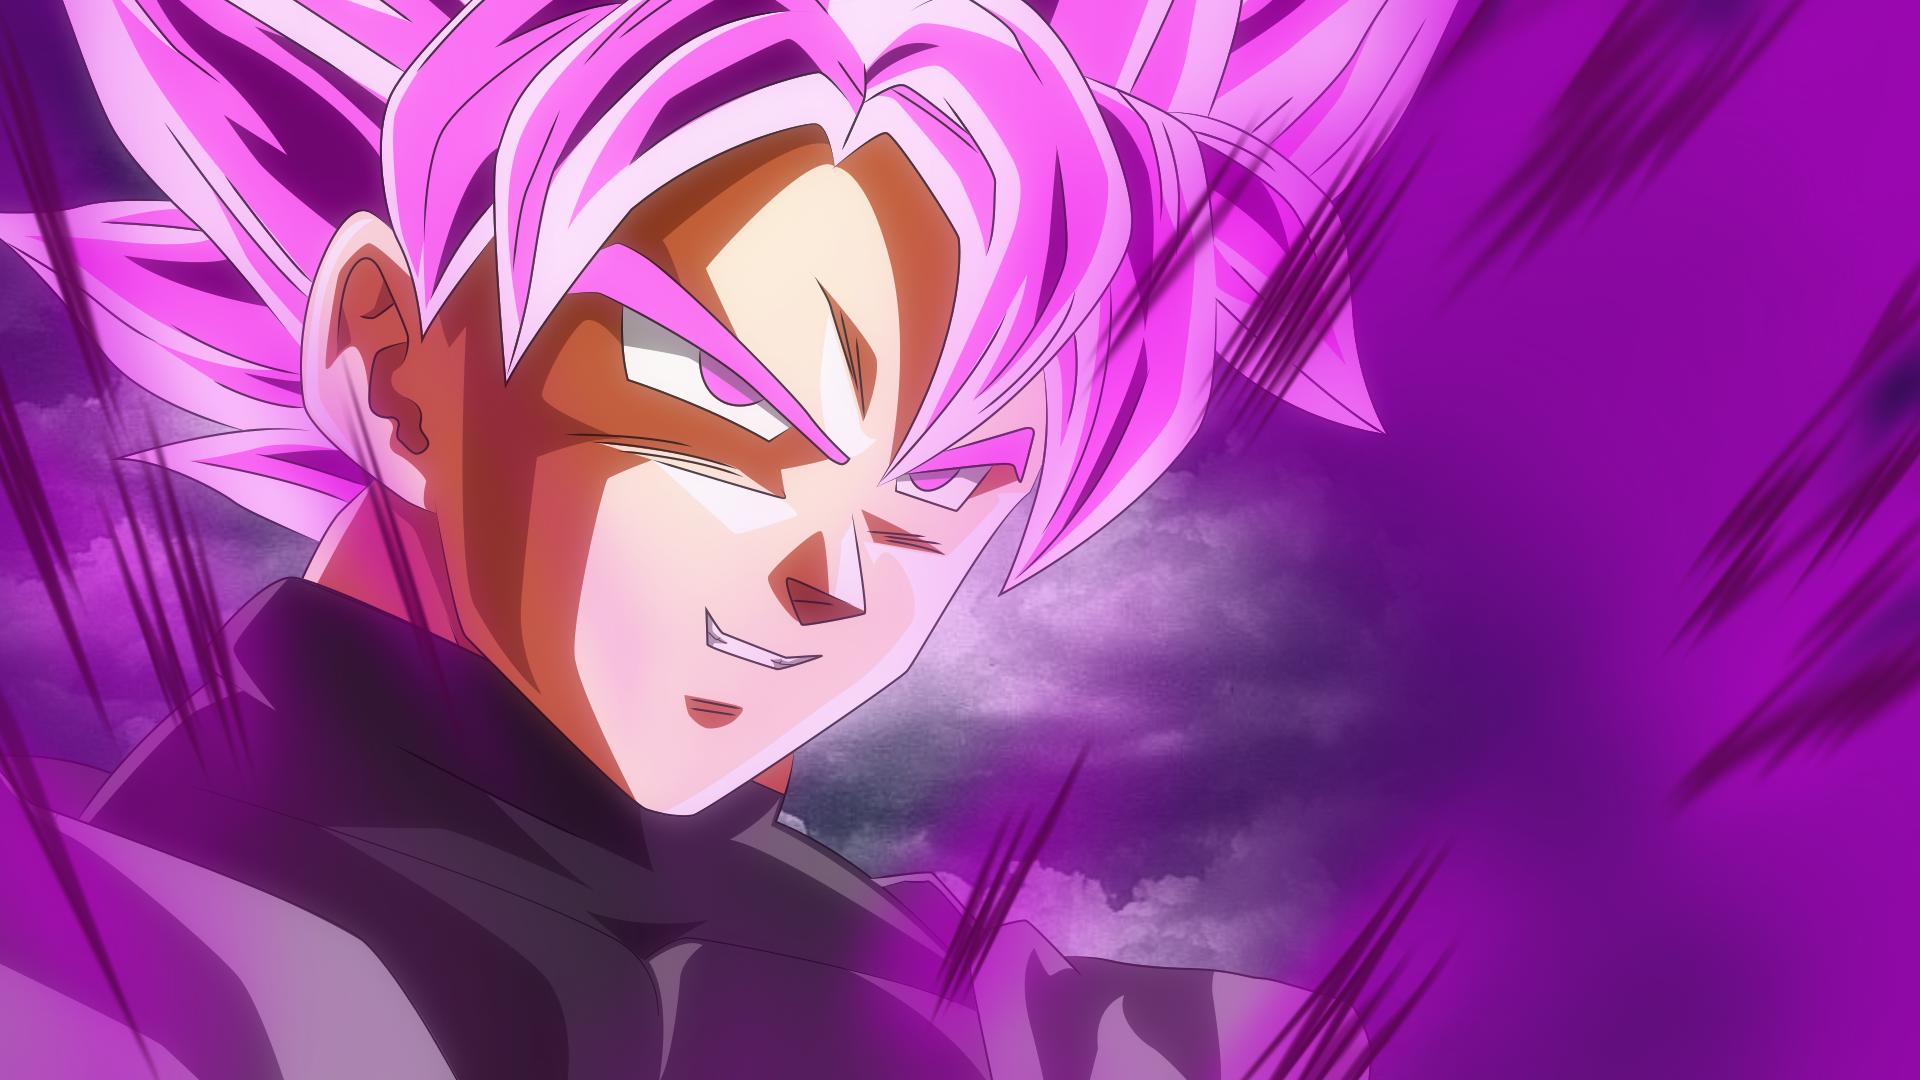 Anime 1920x1080 Dragon Ball Super Black Goku SSJ Rosé Super Saiyajin Rosé Super Saiyan Rosé Dragon Ball